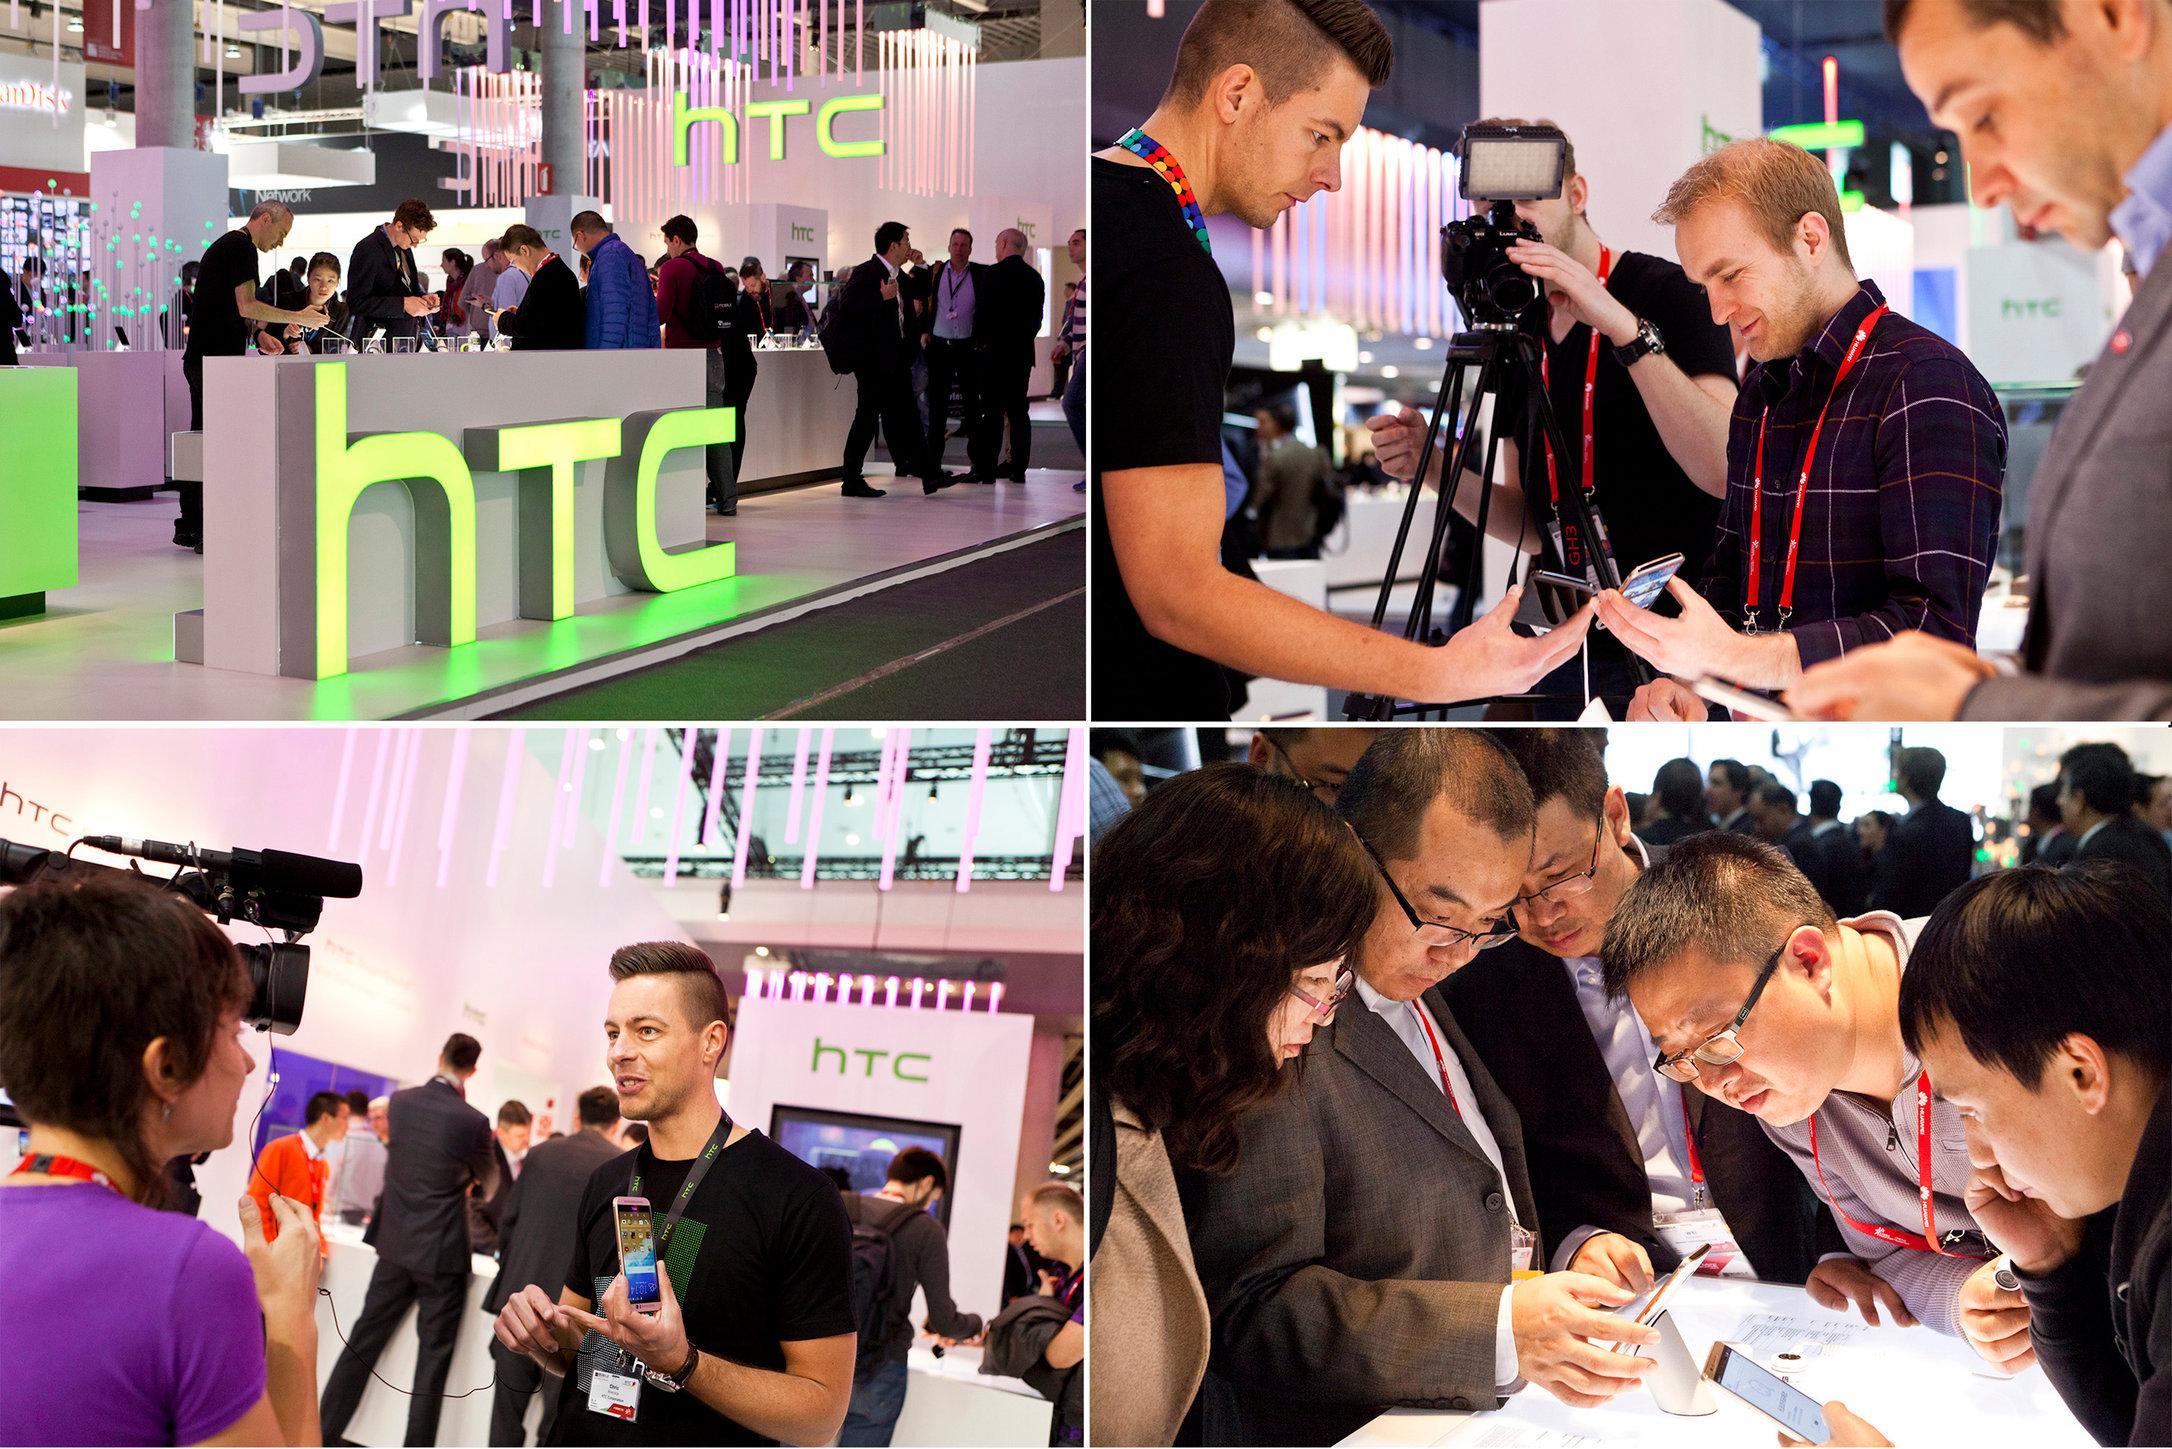 0006_HTC-MWC2015-3576-HighRes.jpg